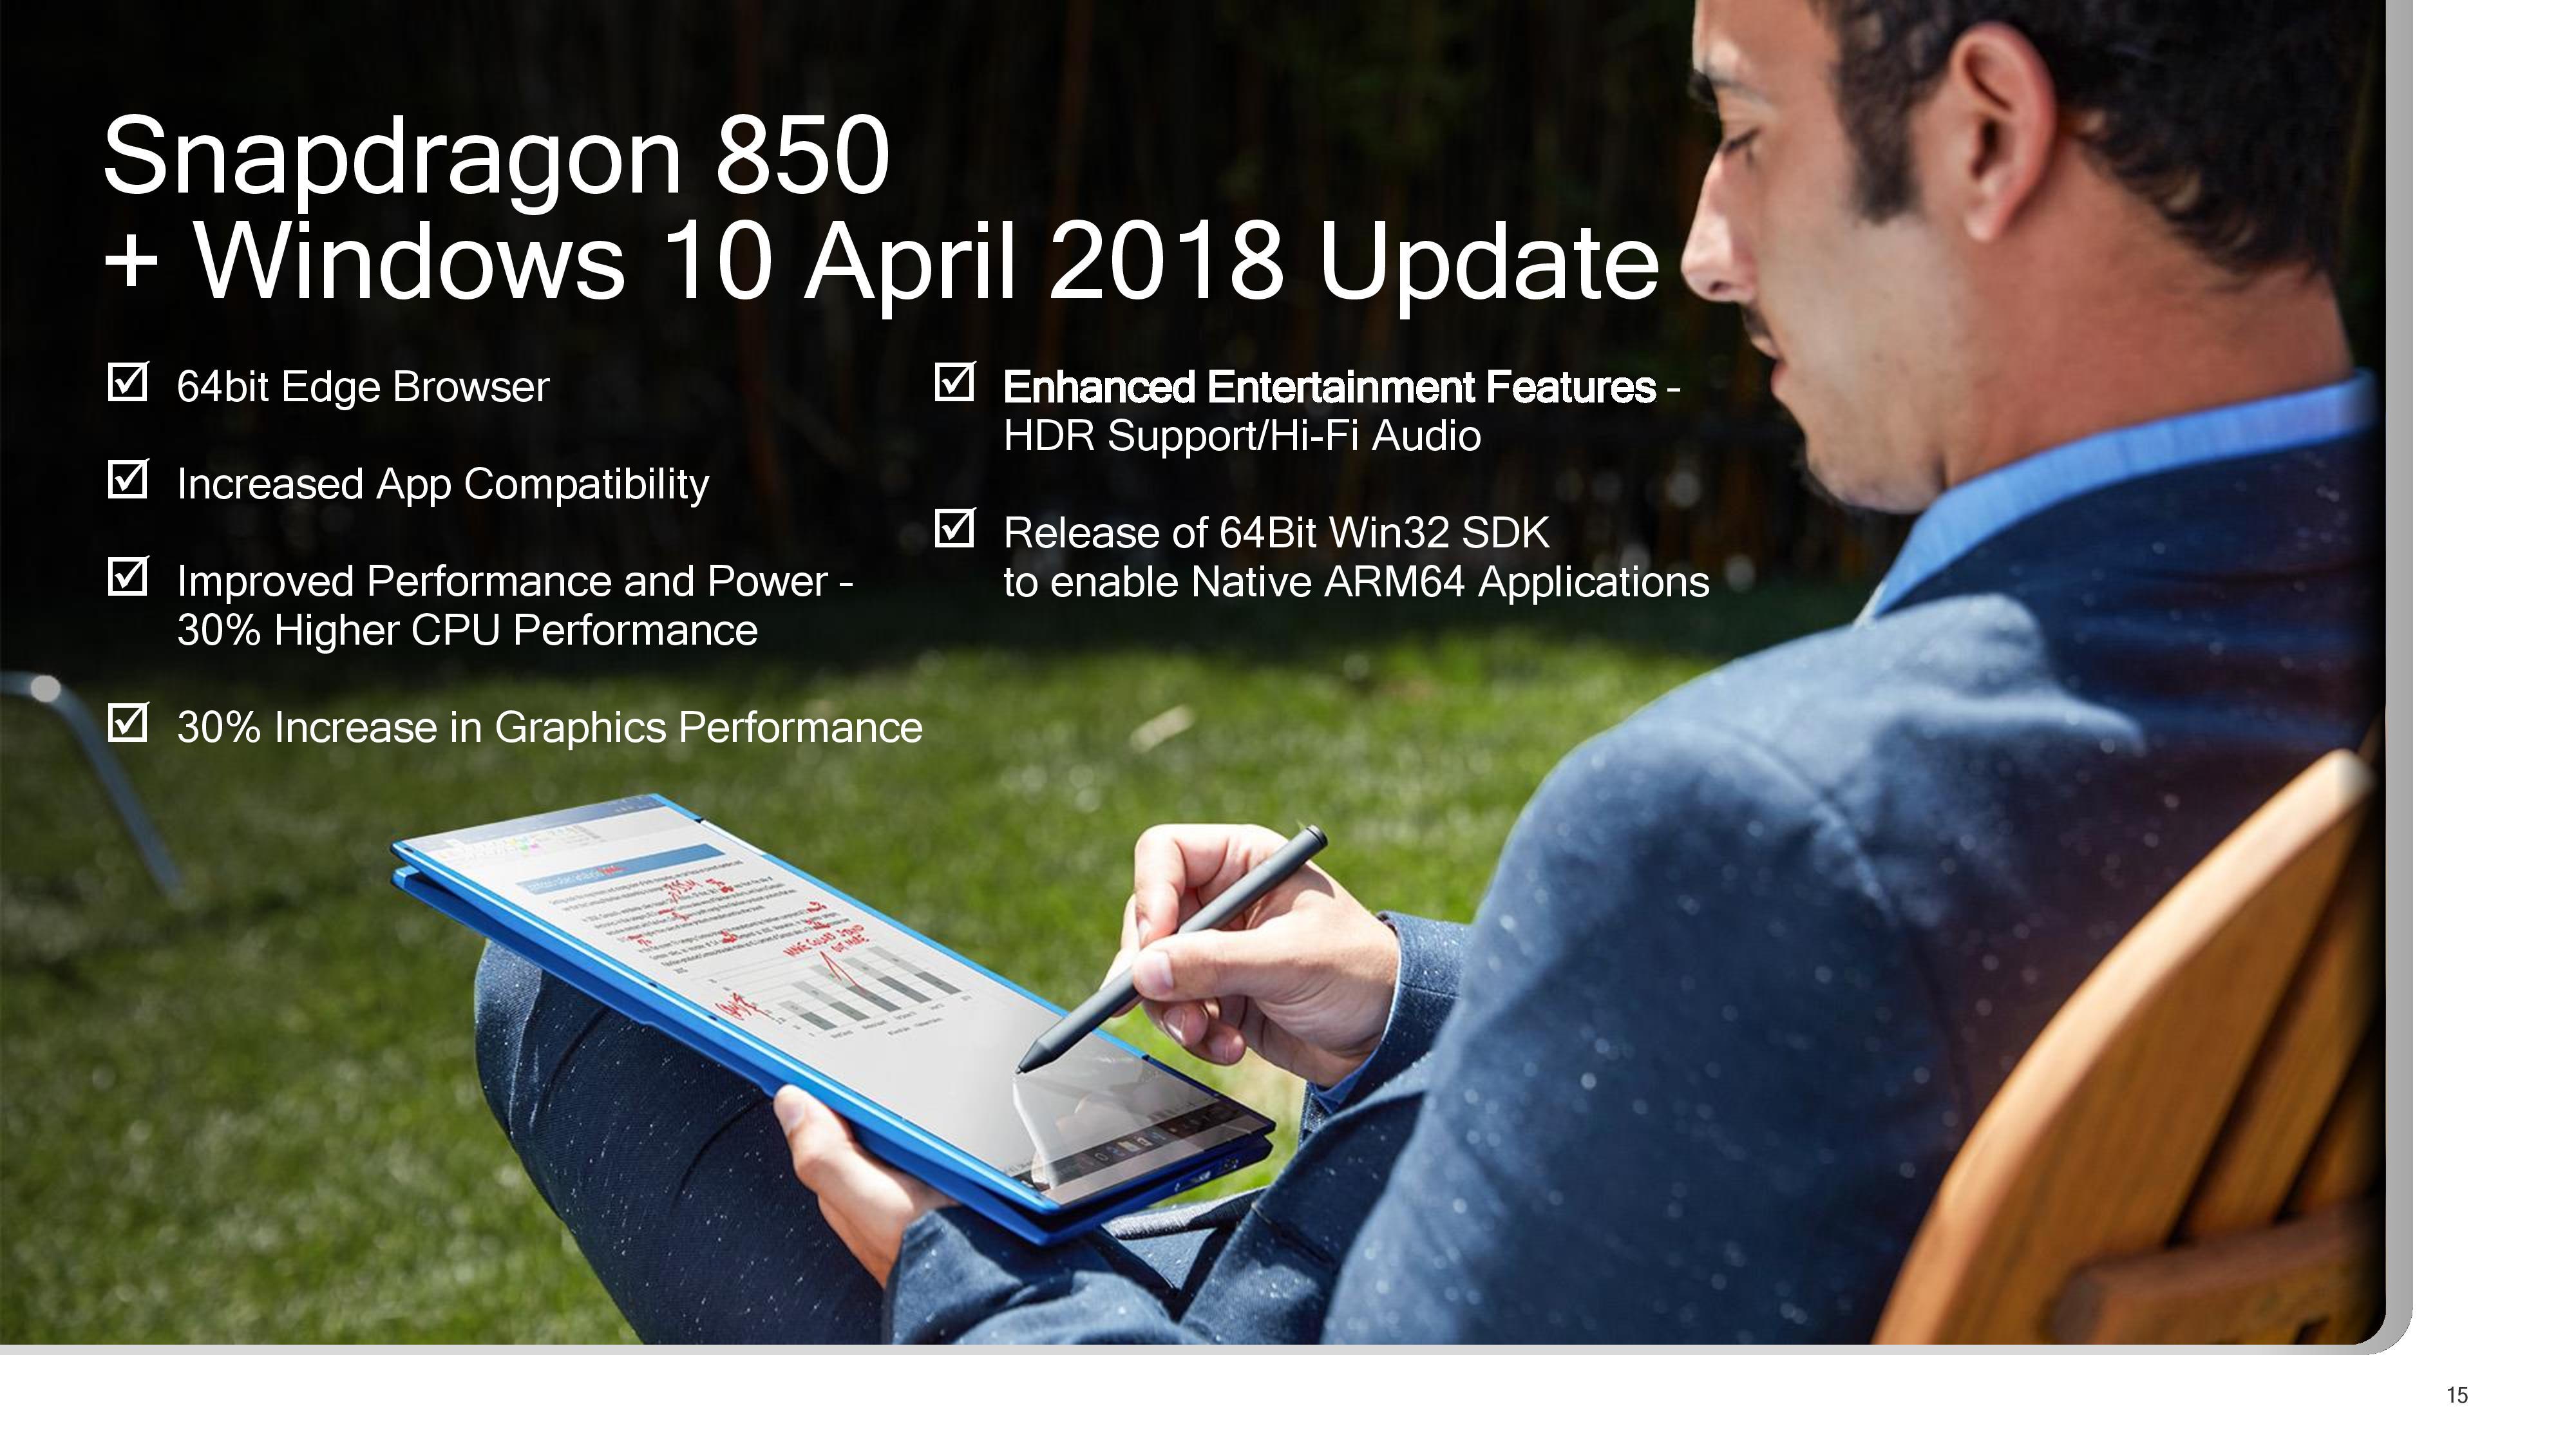 Qualcomm announces Snapdragon 850 Mobile processor for Always Connected Windows 10 PCs 2